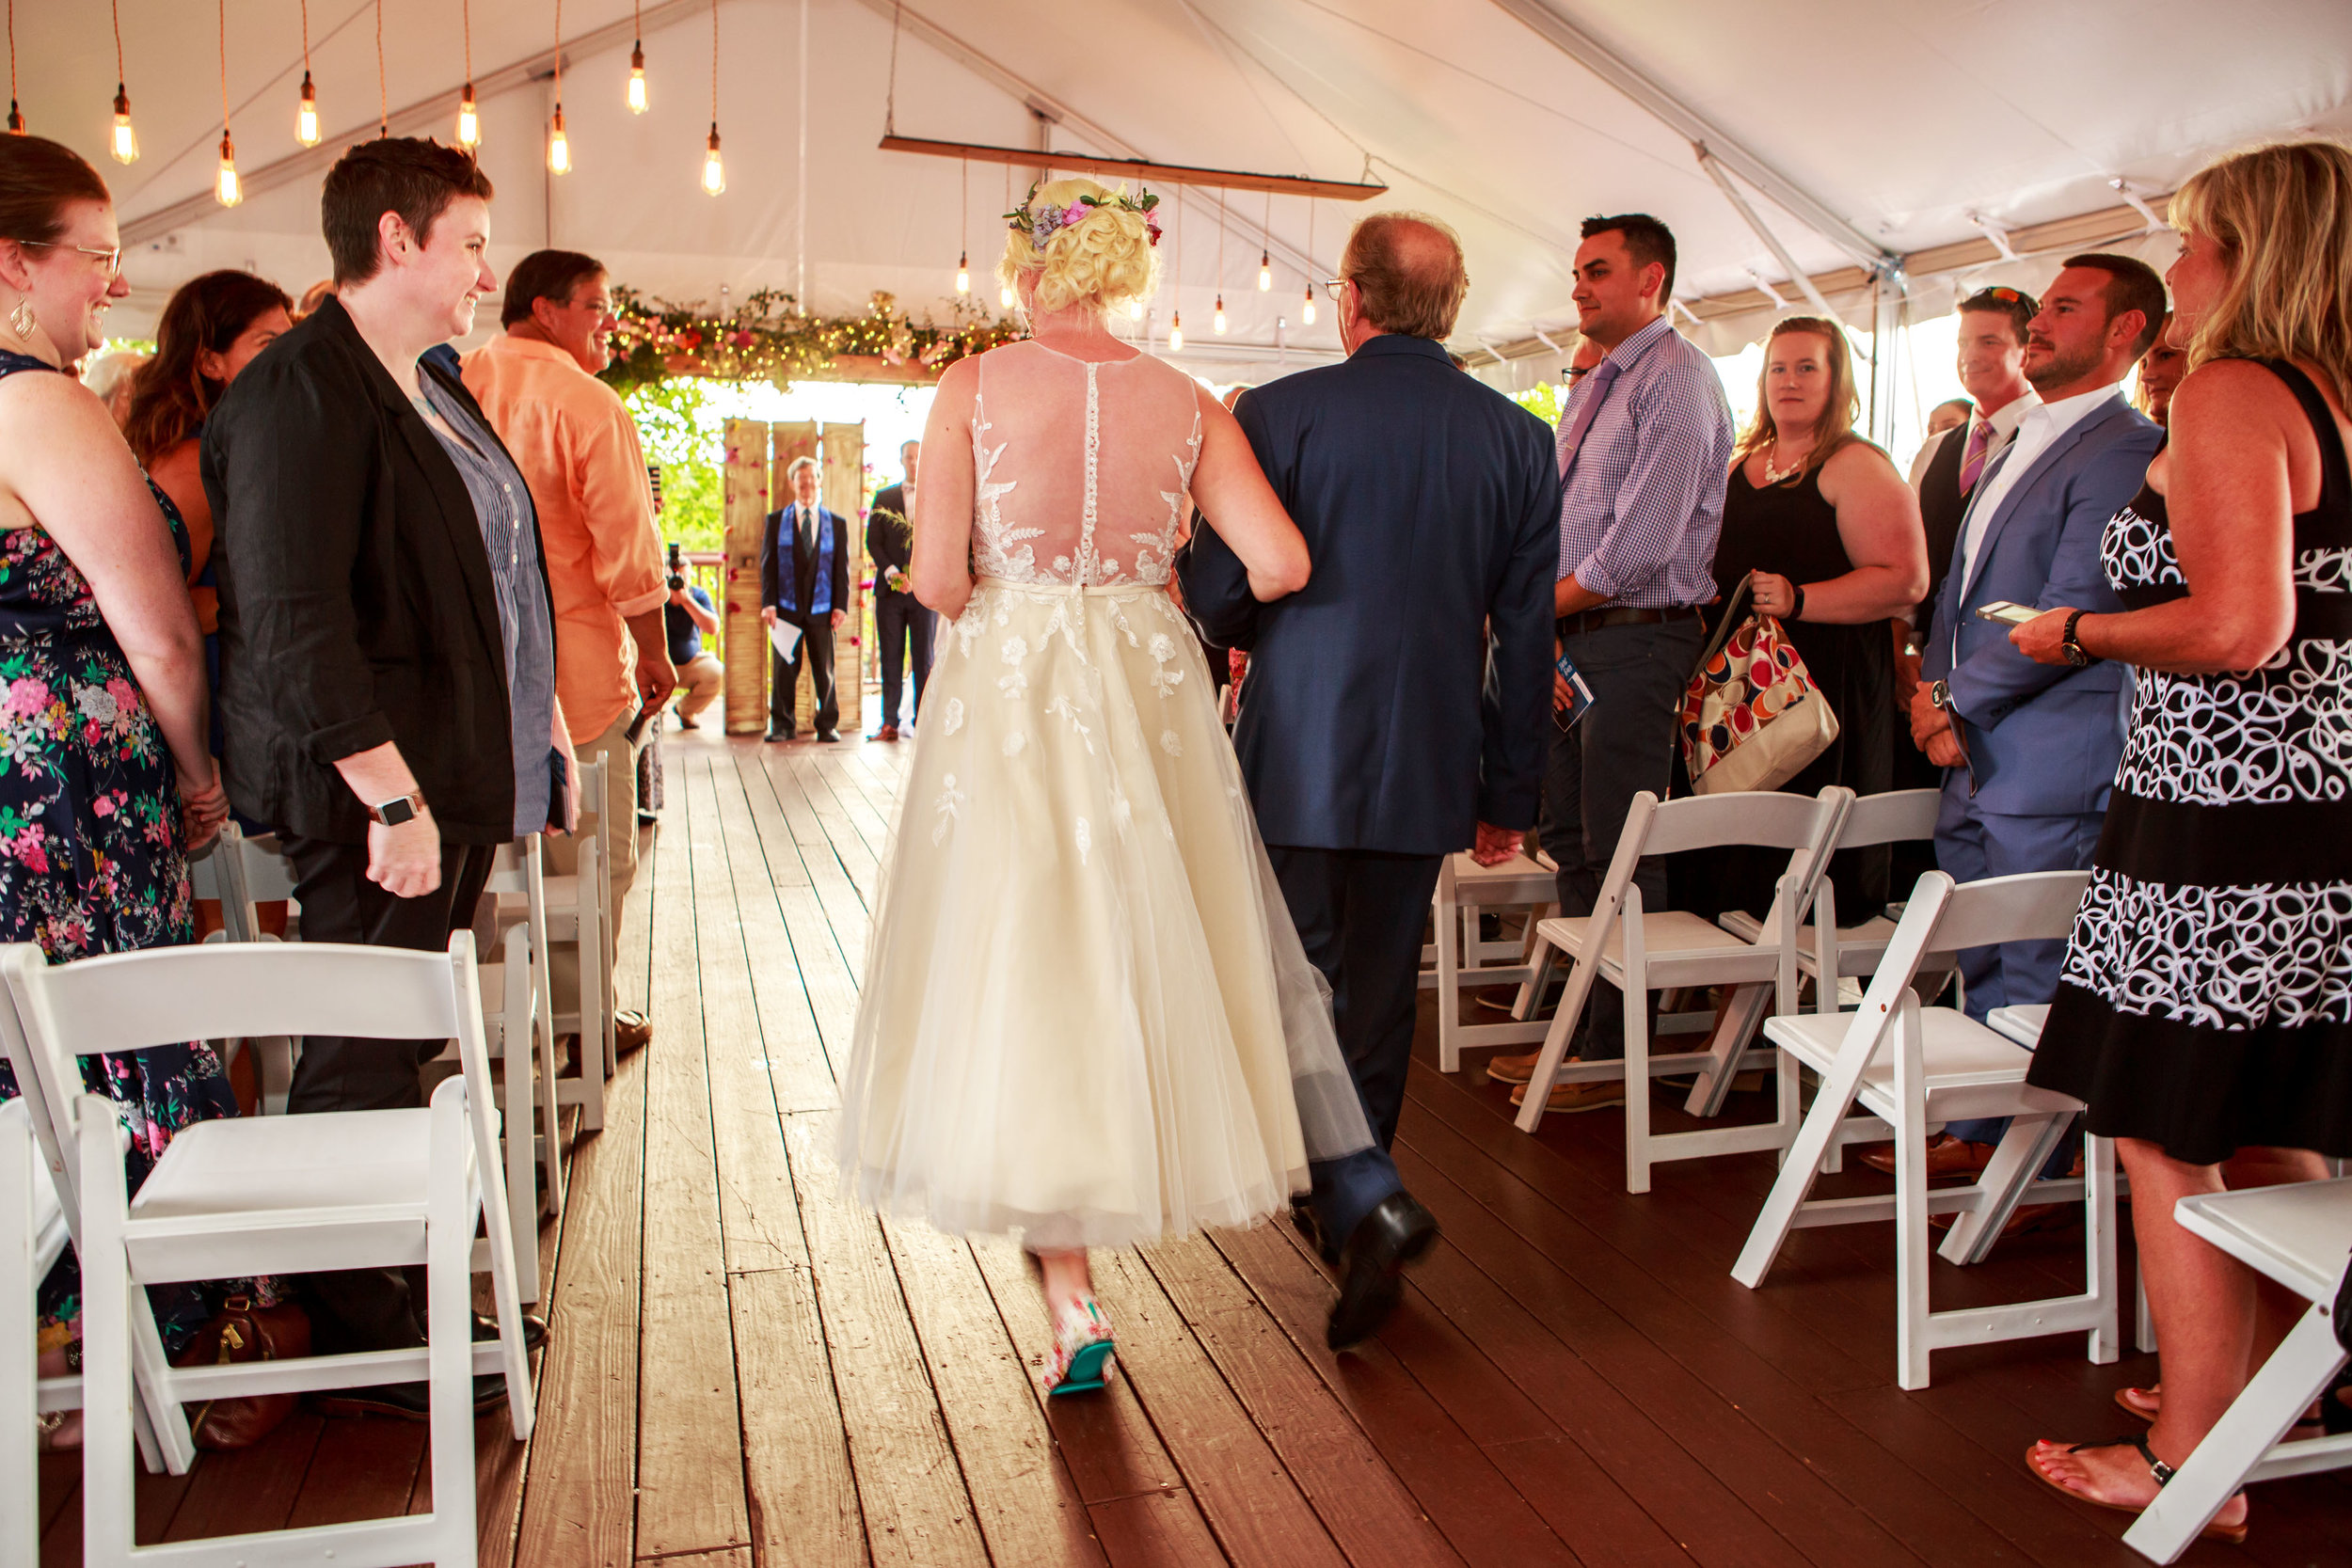 128-South-Wedding-Wilmington-NC-Photographer-Ceremony-12.1.jpg